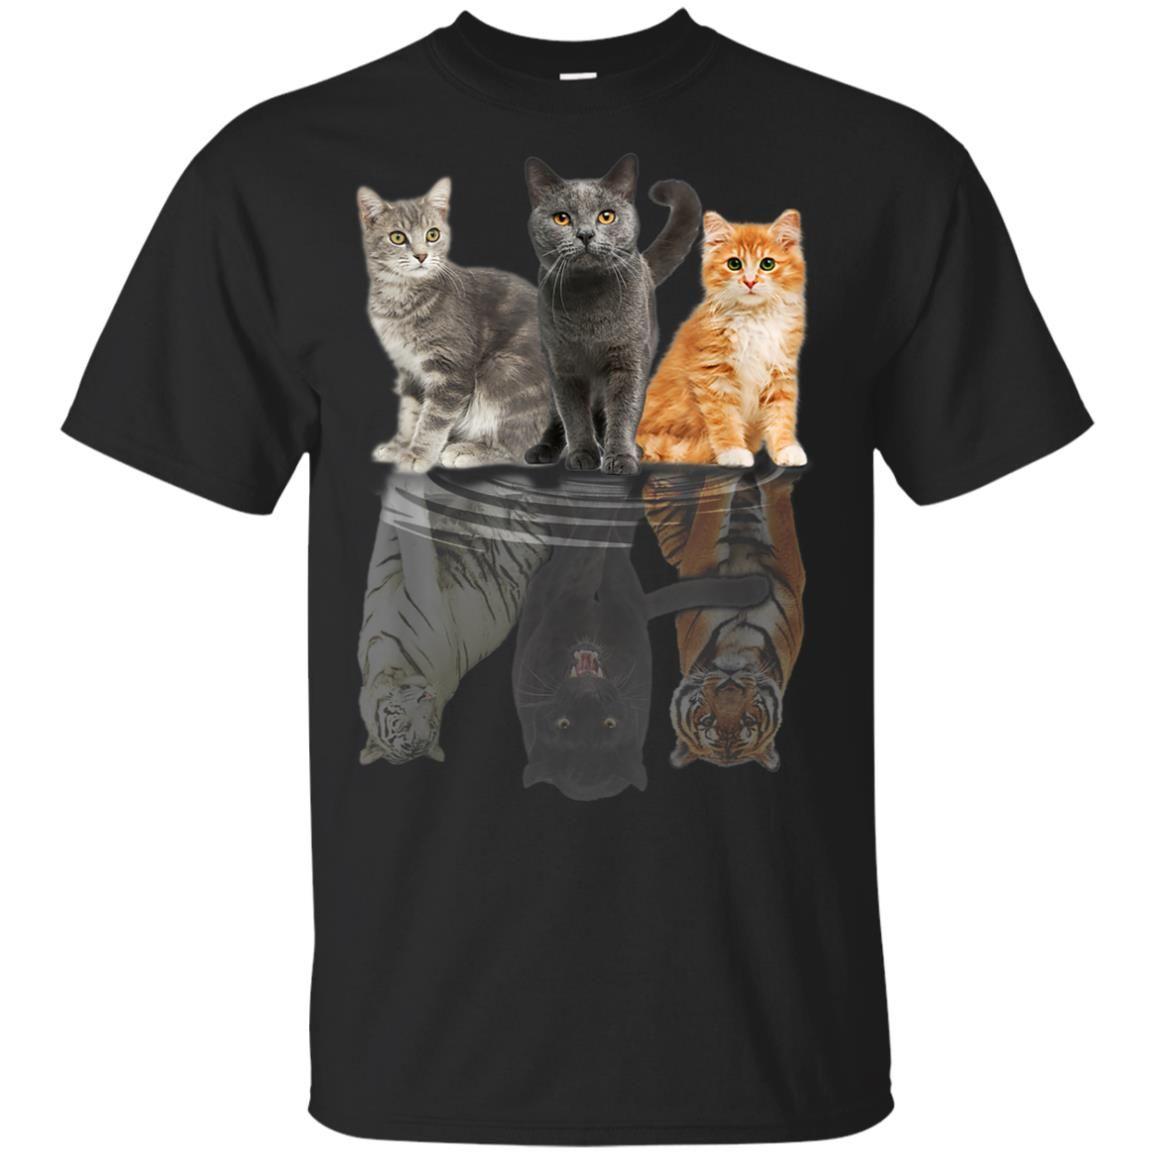 Cats Reflection Mirror Puma Cheetah Tiger Funny Cat Lover Shirt Hoodie Sweatshirt Cameow Cat Lover Shirt Lover Shirts Cat Lovers